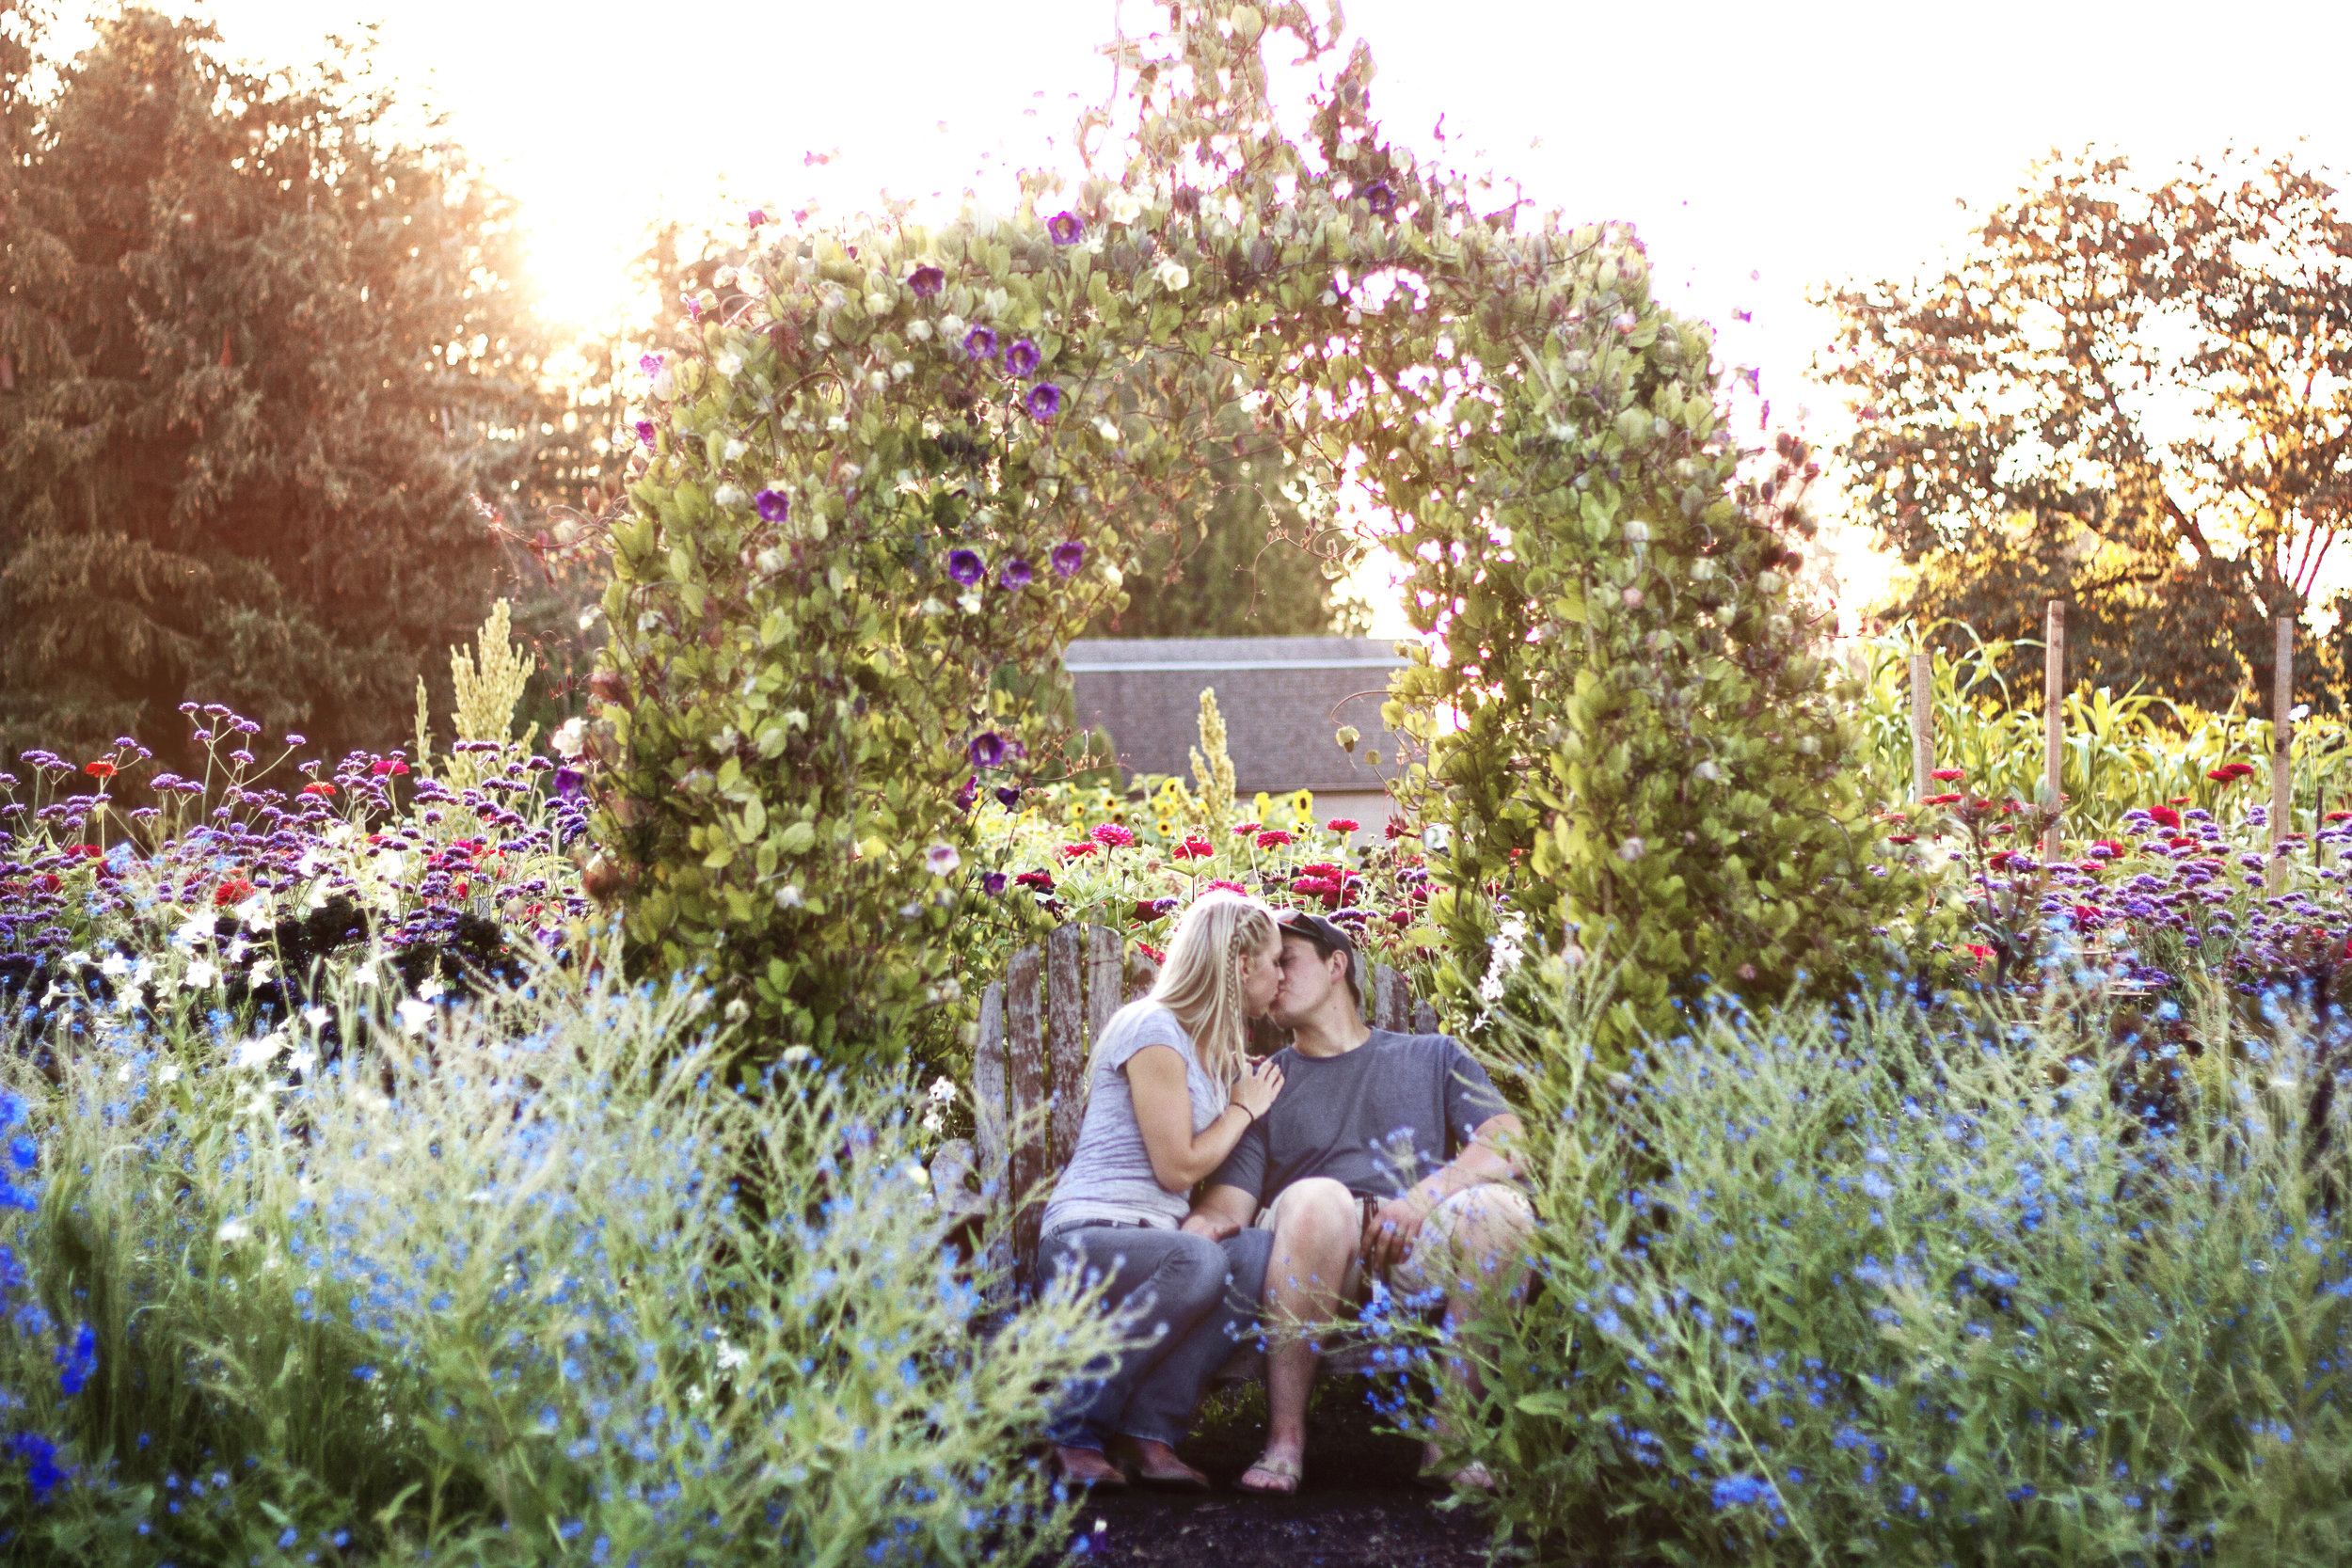 reduced_ss_amanda_dillon_flower_field_sunset.jpg